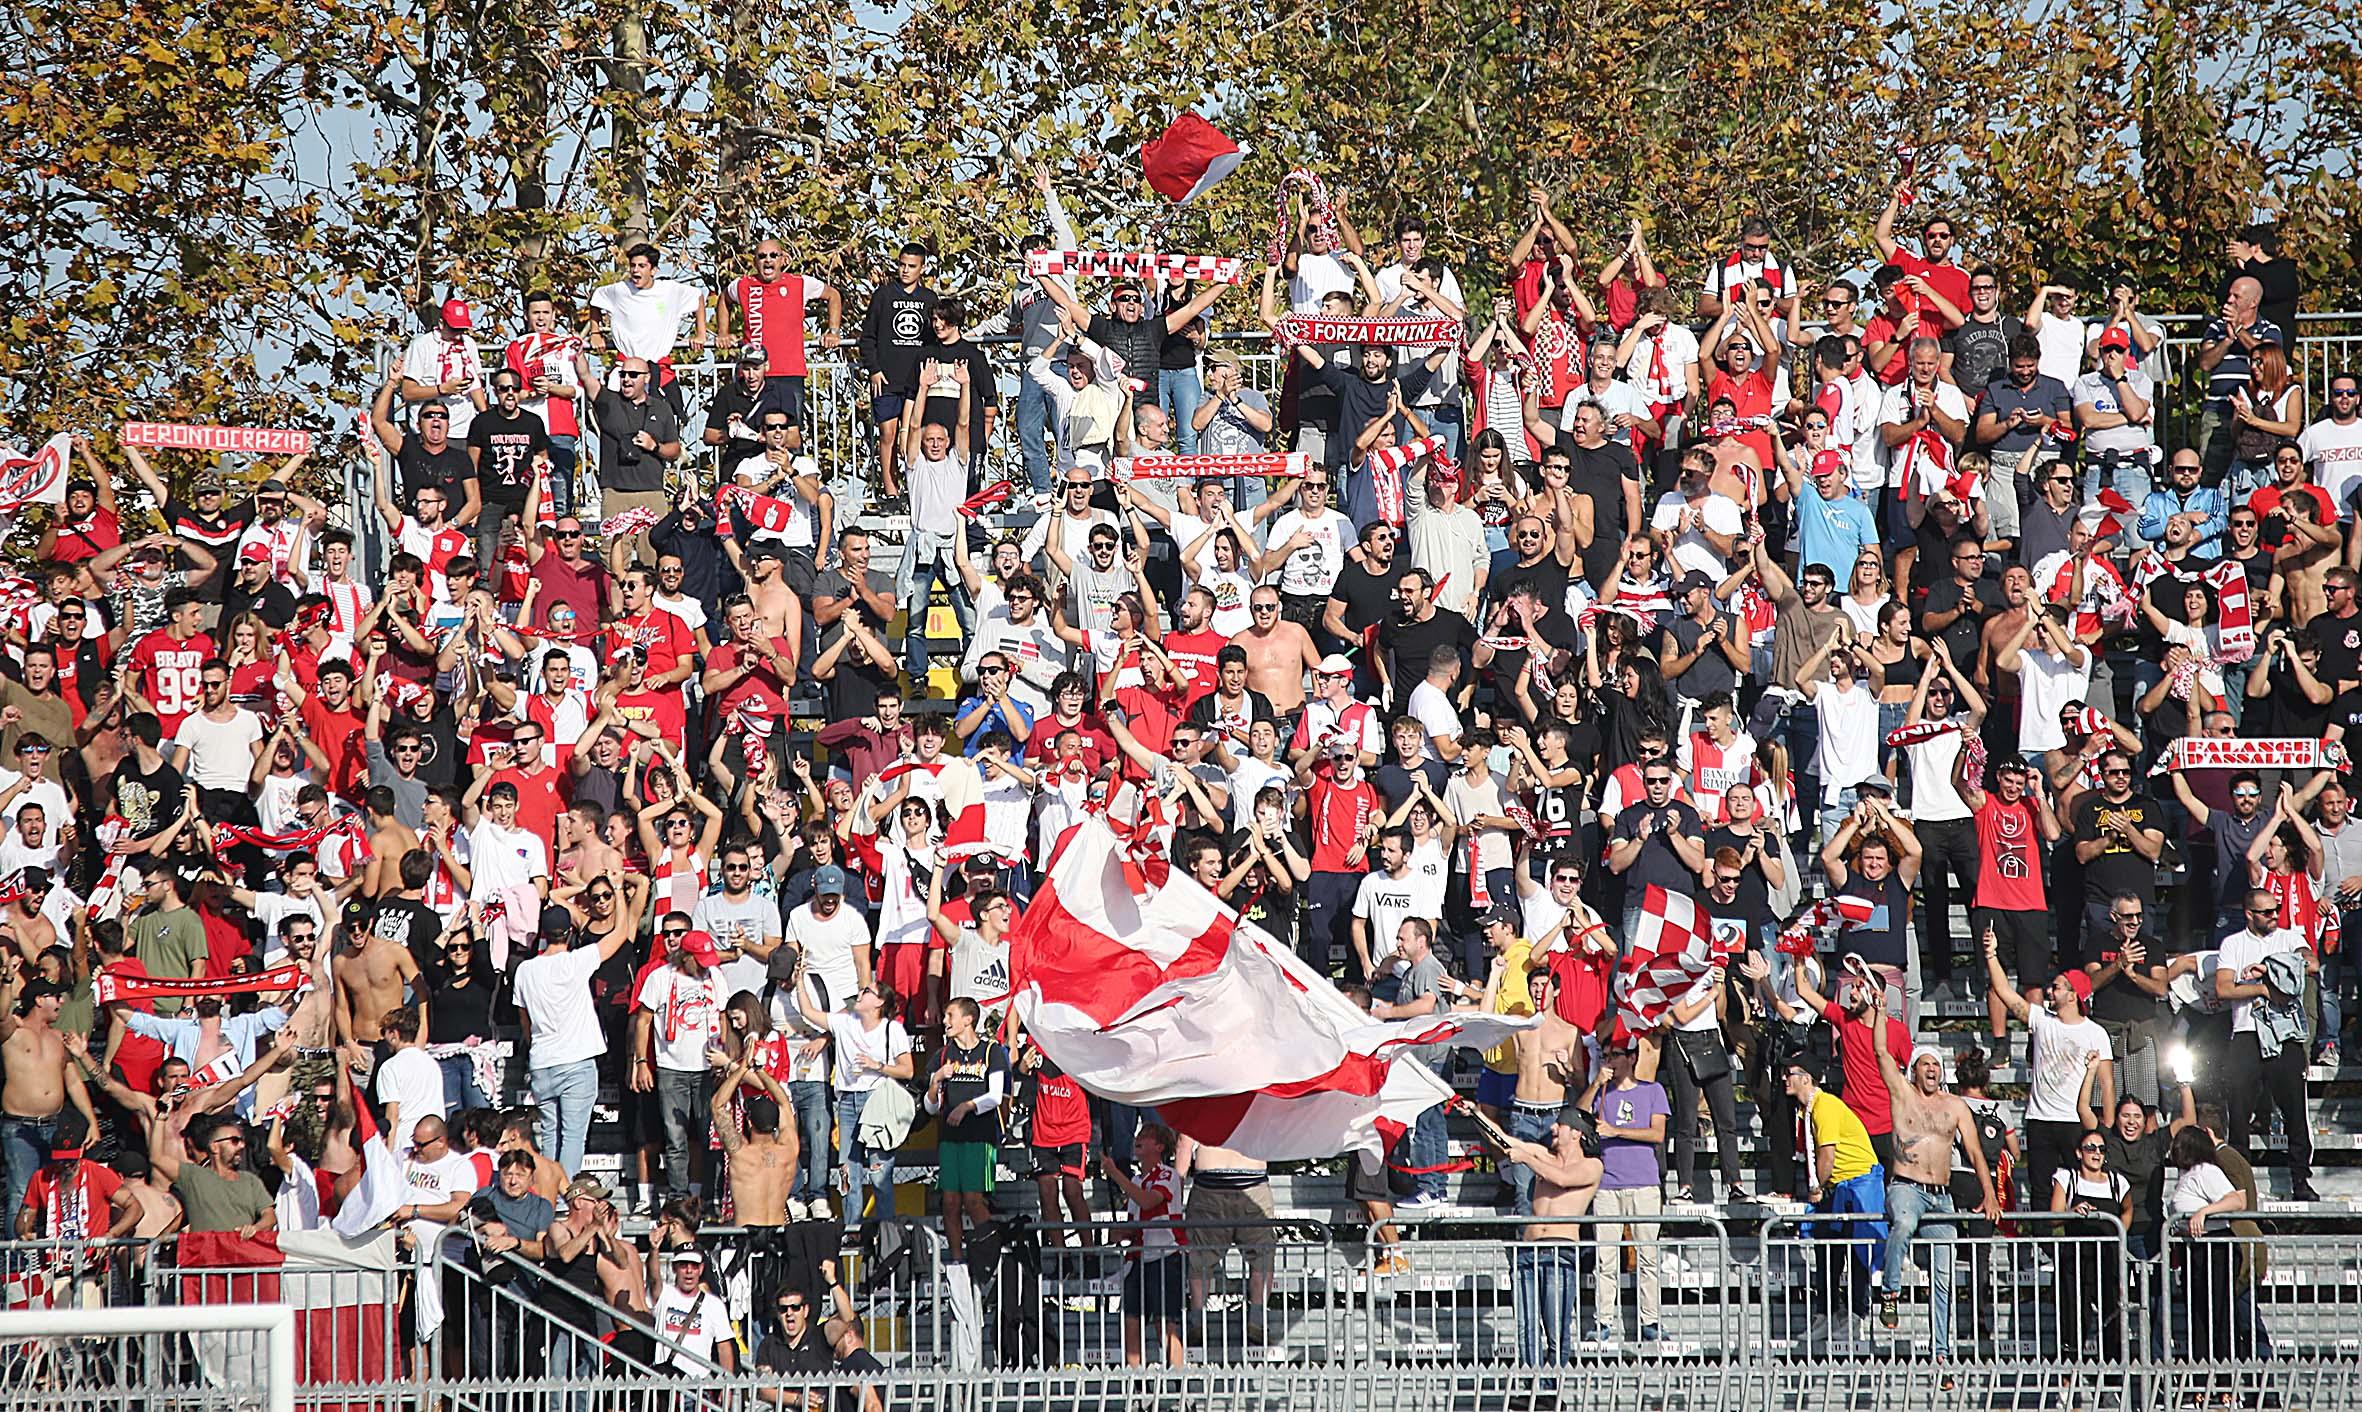 Calcio serie C, la prevendita per Reggio Audace-Rimini di mercoledì